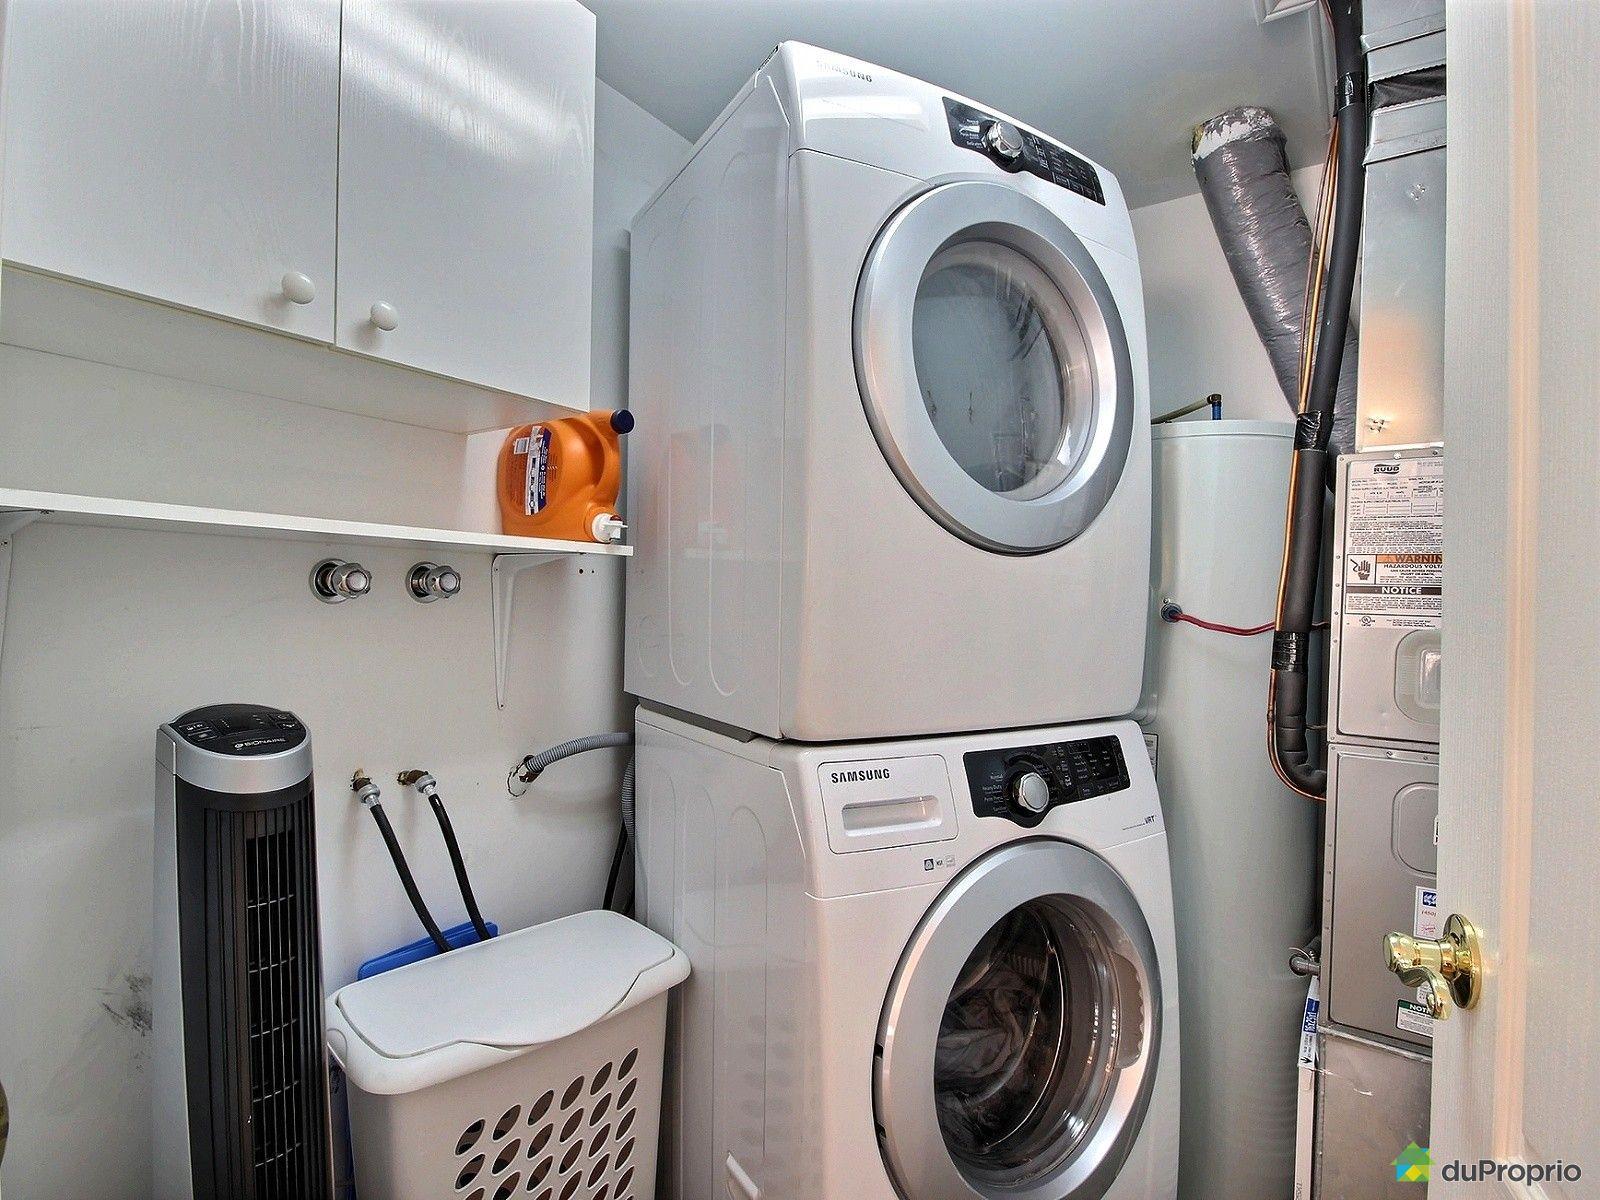 condo vendre montr al 111 4750 rue joseph a rodier immobilier qu bec duproprio 559230. Black Bedroom Furniture Sets. Home Design Ideas